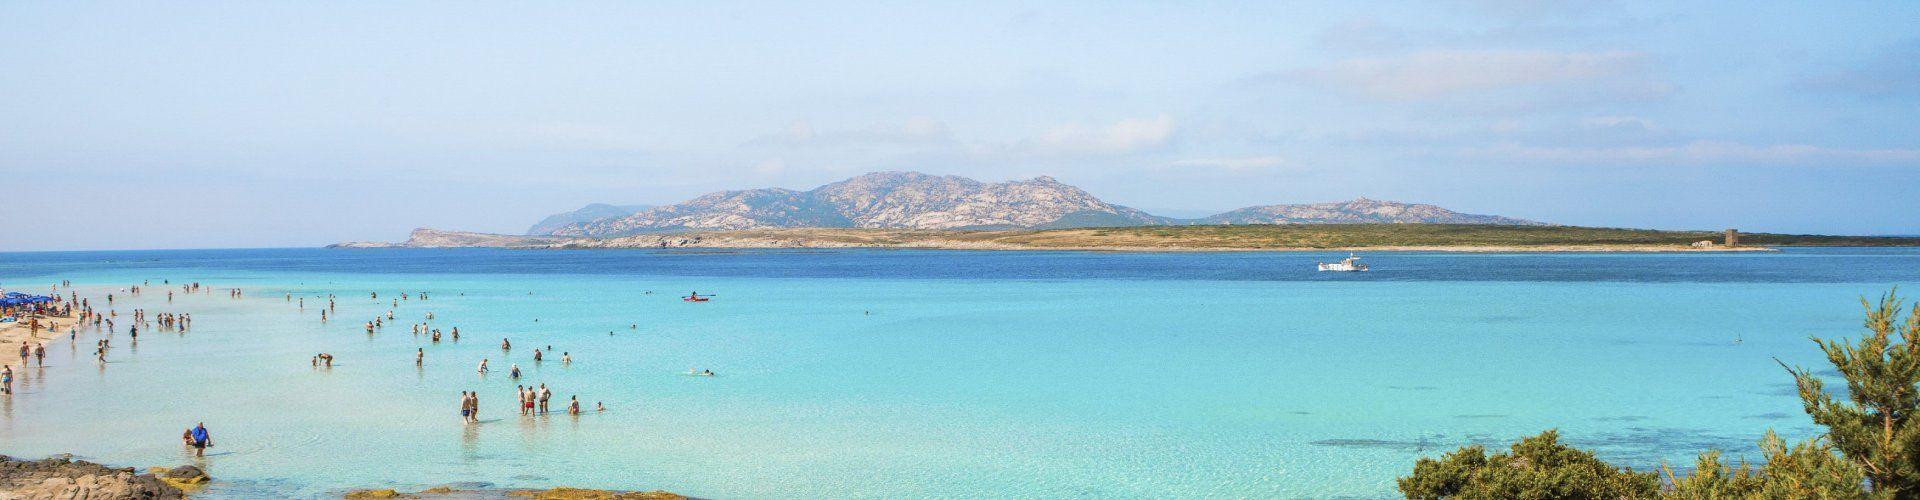 Crystal clear sea in front of the beach La Pelosa Stintino